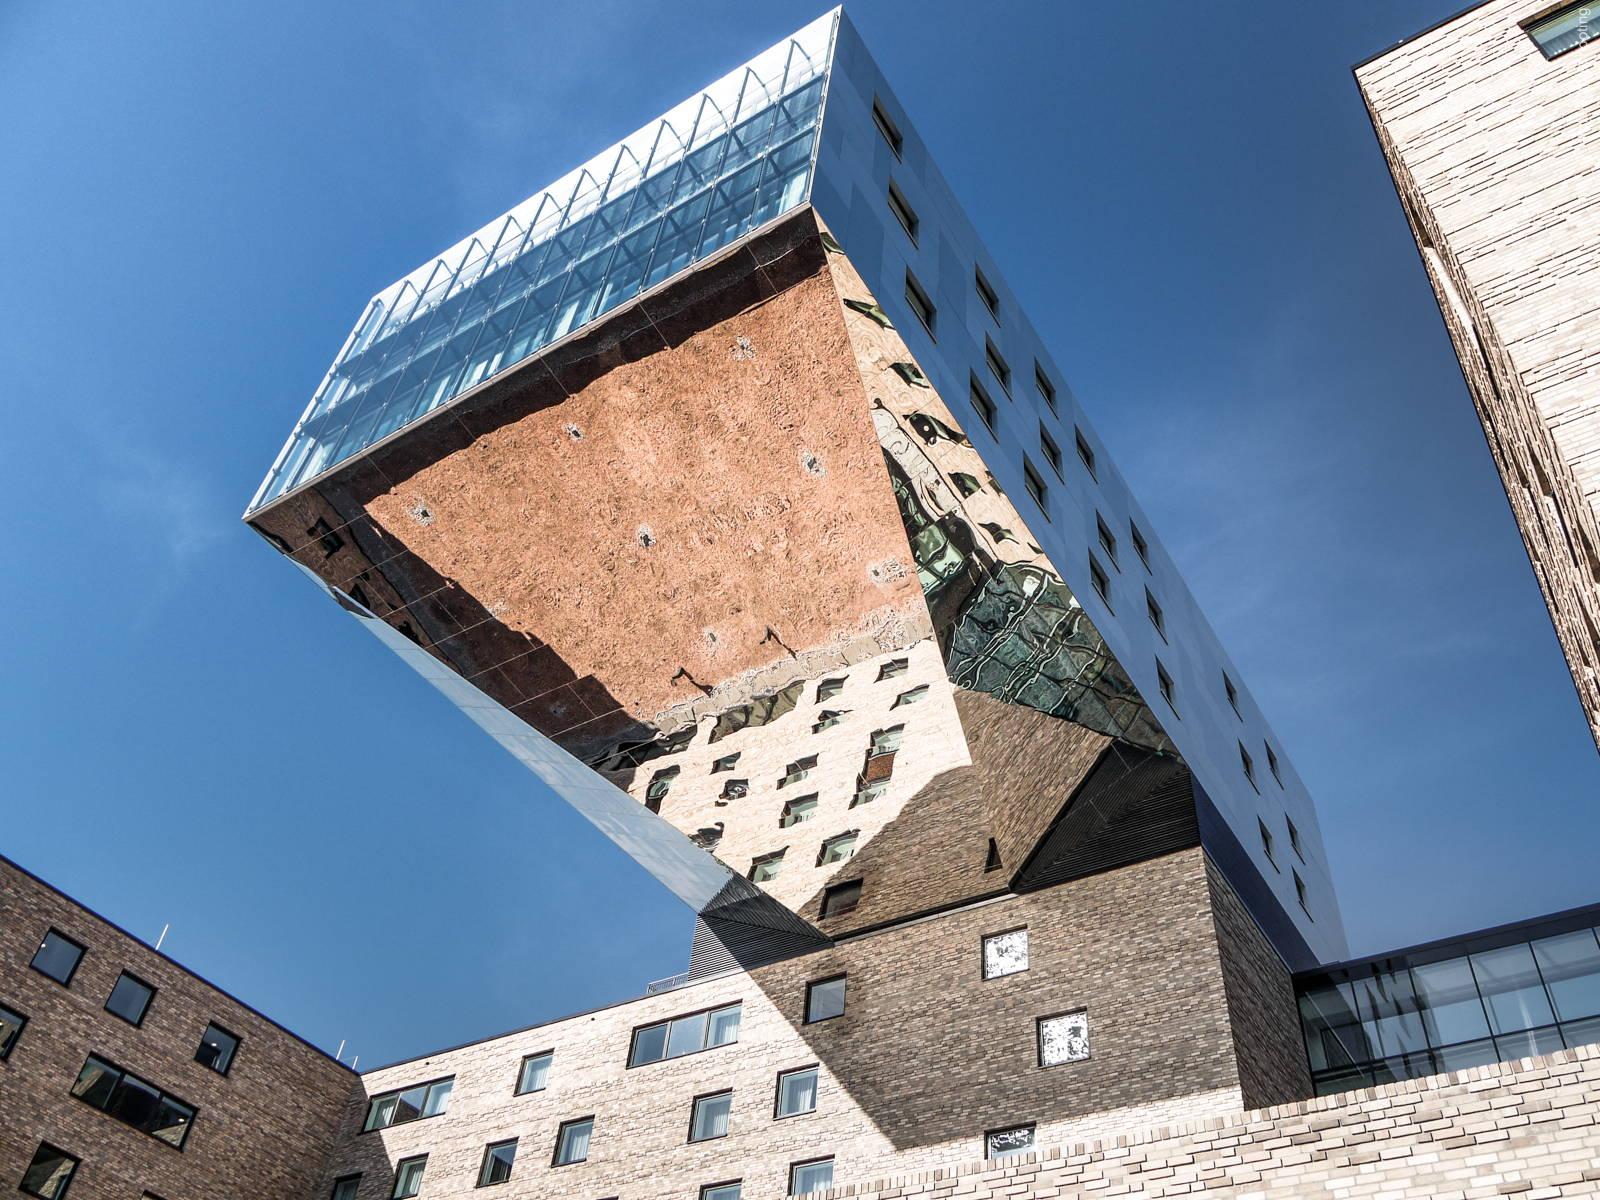 nhow Hotel, Berlin - NPS Tchoban Voss